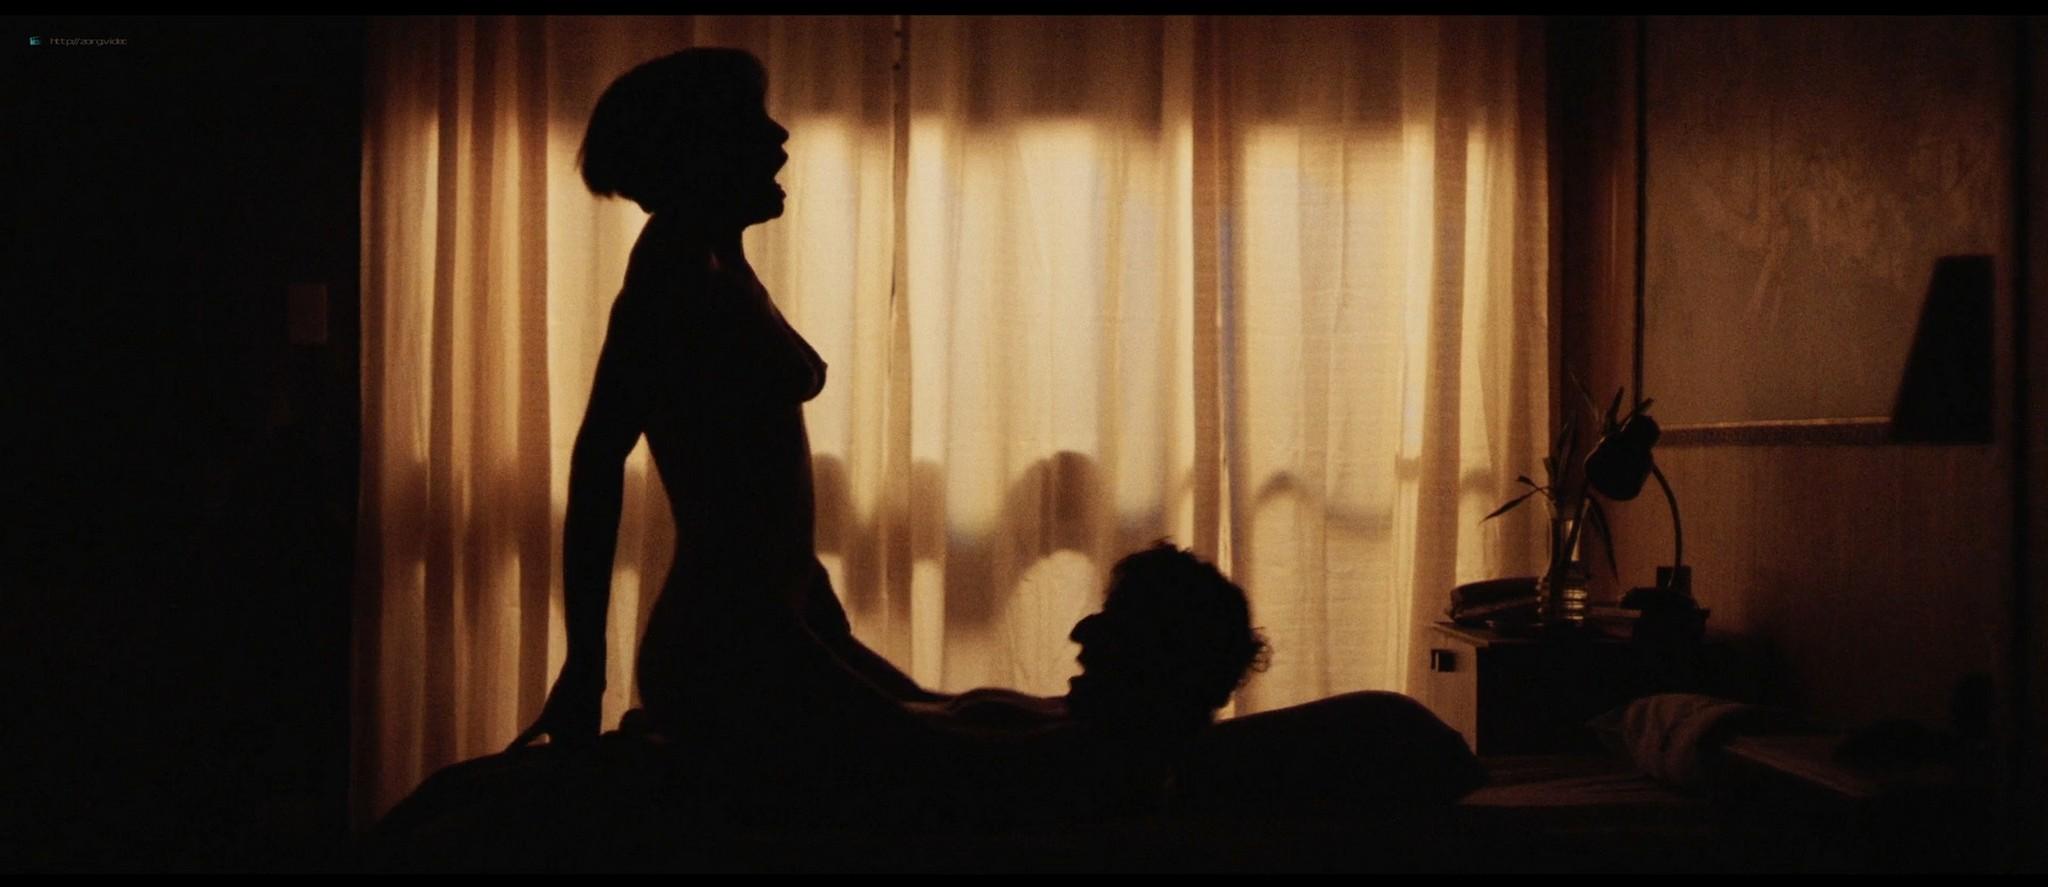 Julianne Nicholson nude sex Sabrina Alfonso nude too - Initials SG (AR-2019) HD 1080p Web (14)